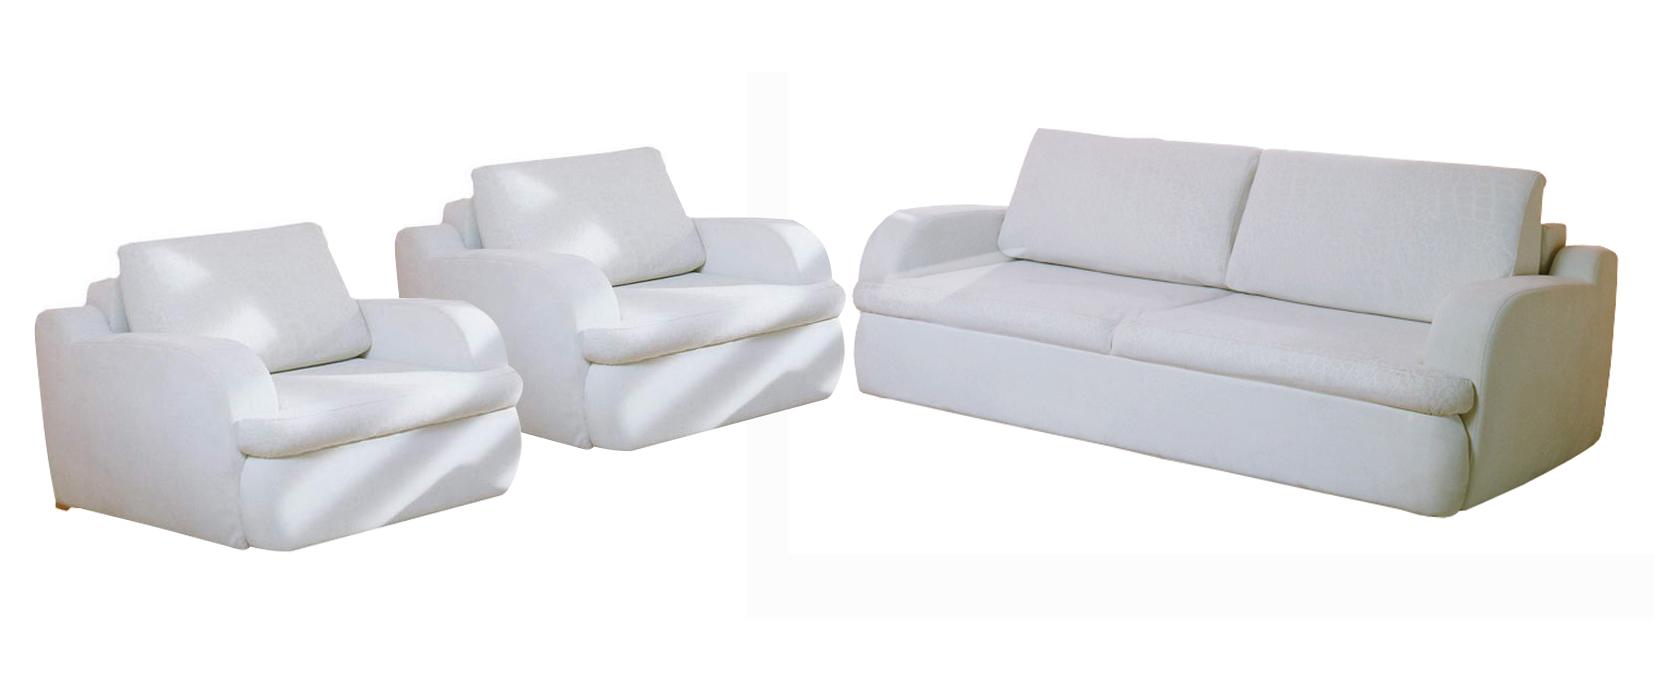 Комплект мягкой мебели Мустанг Фиеста Размер: диван: 232х115 В90 (сп. м. 147х190), кресло: 115х110 В90 (сп. м. 75х224)